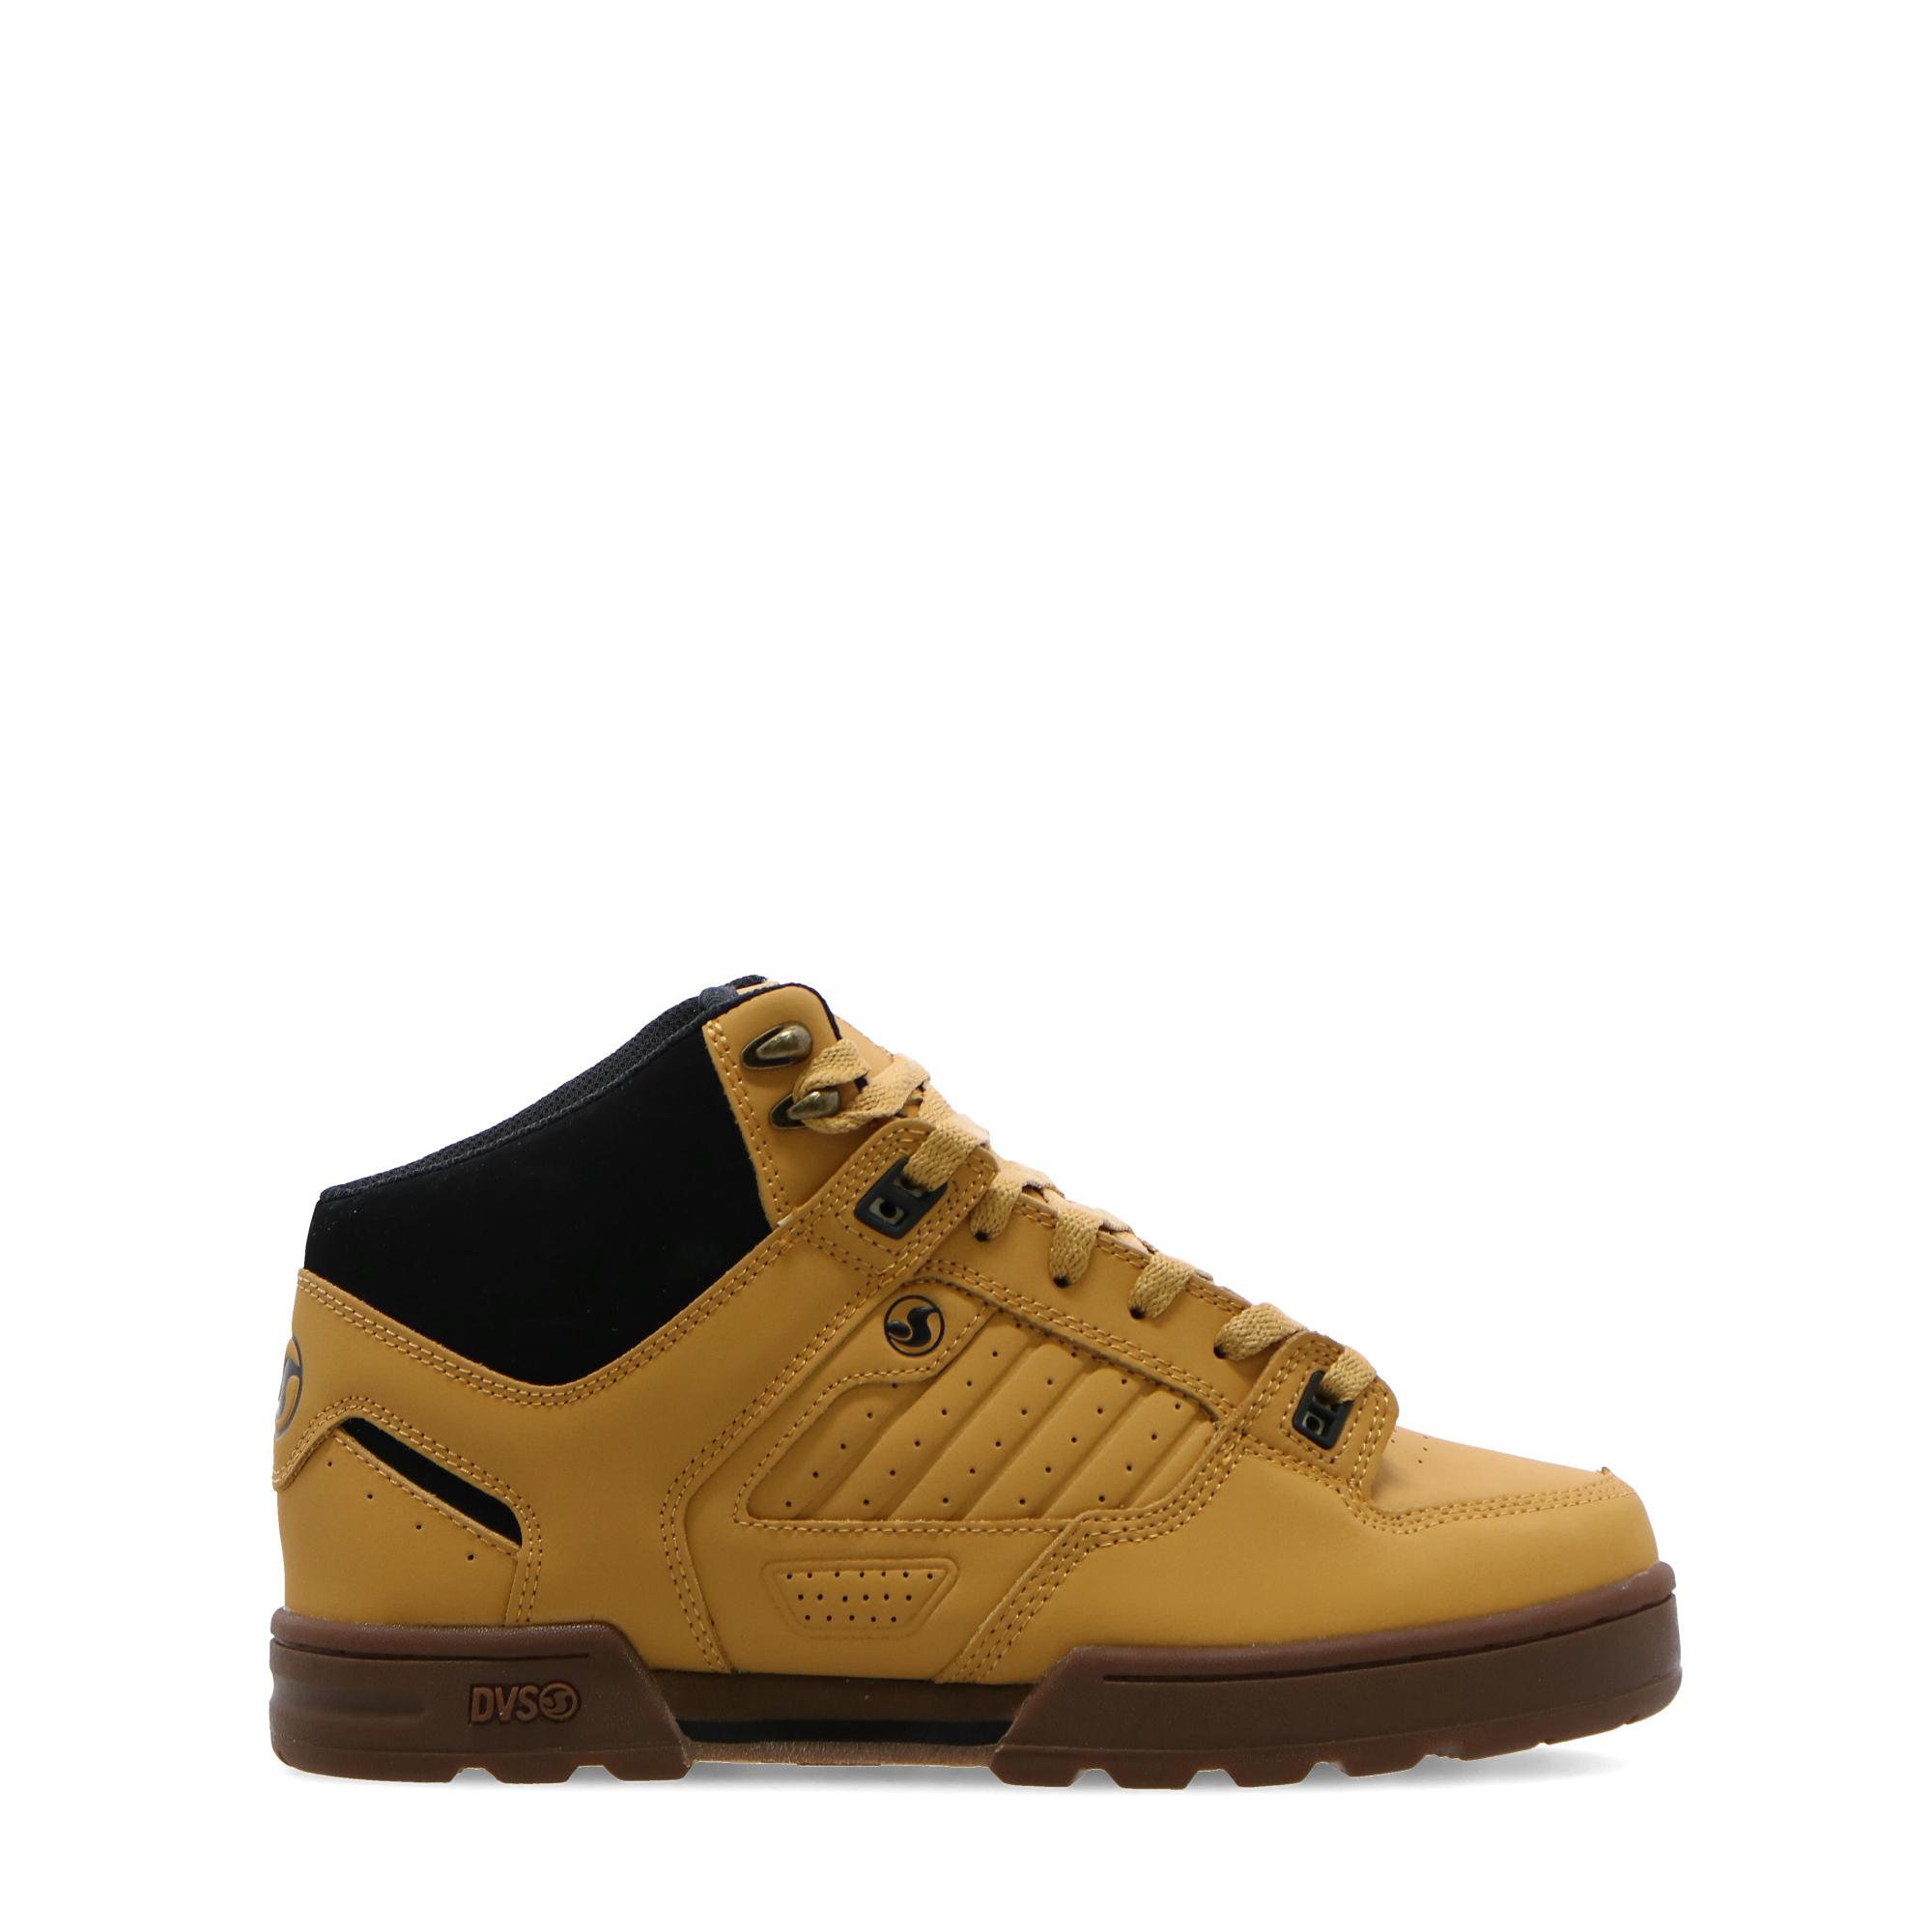 Dvs Militia Boot<br/> Chamois black nubuck